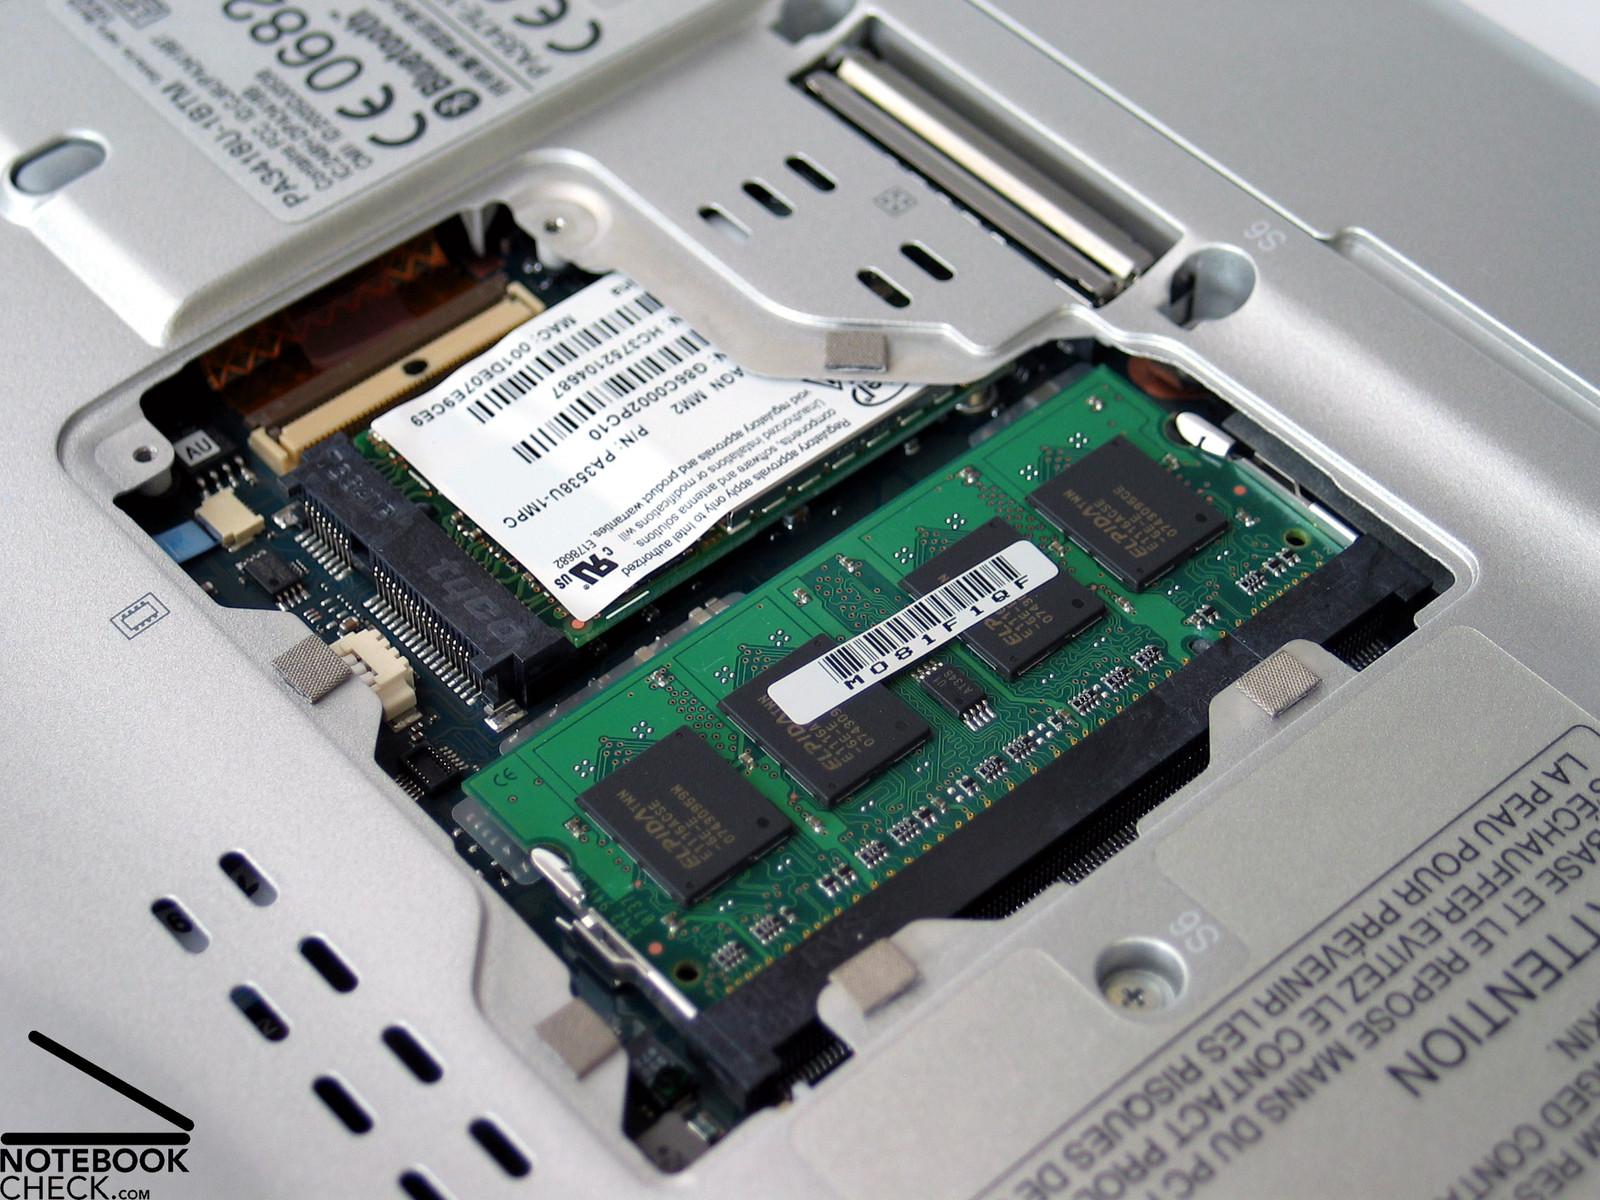 Matshita dvd-ram uj-844s